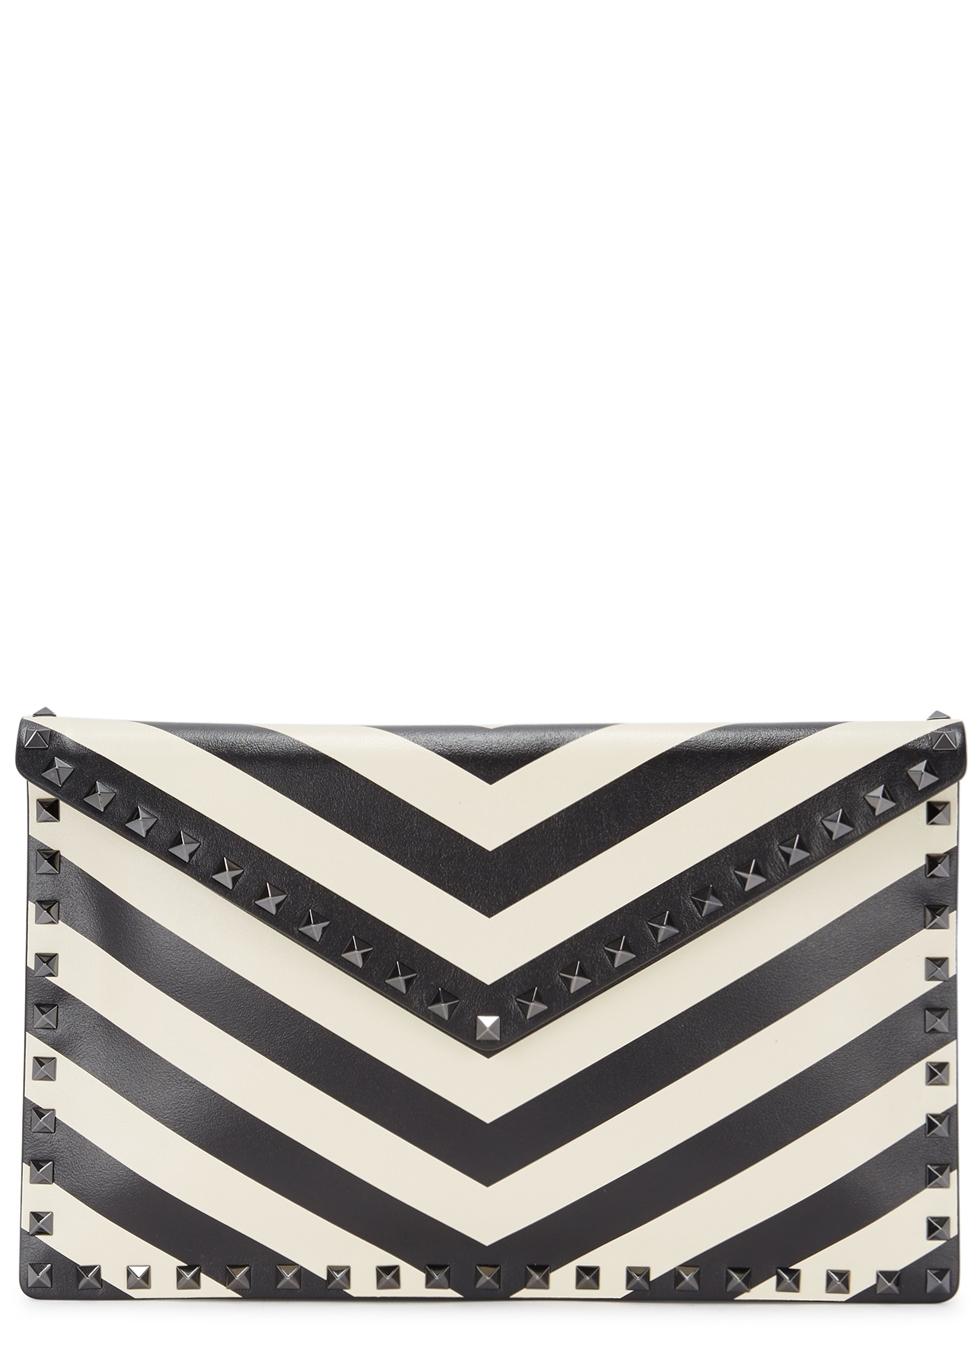 Rockstud striped leather envelope clutch